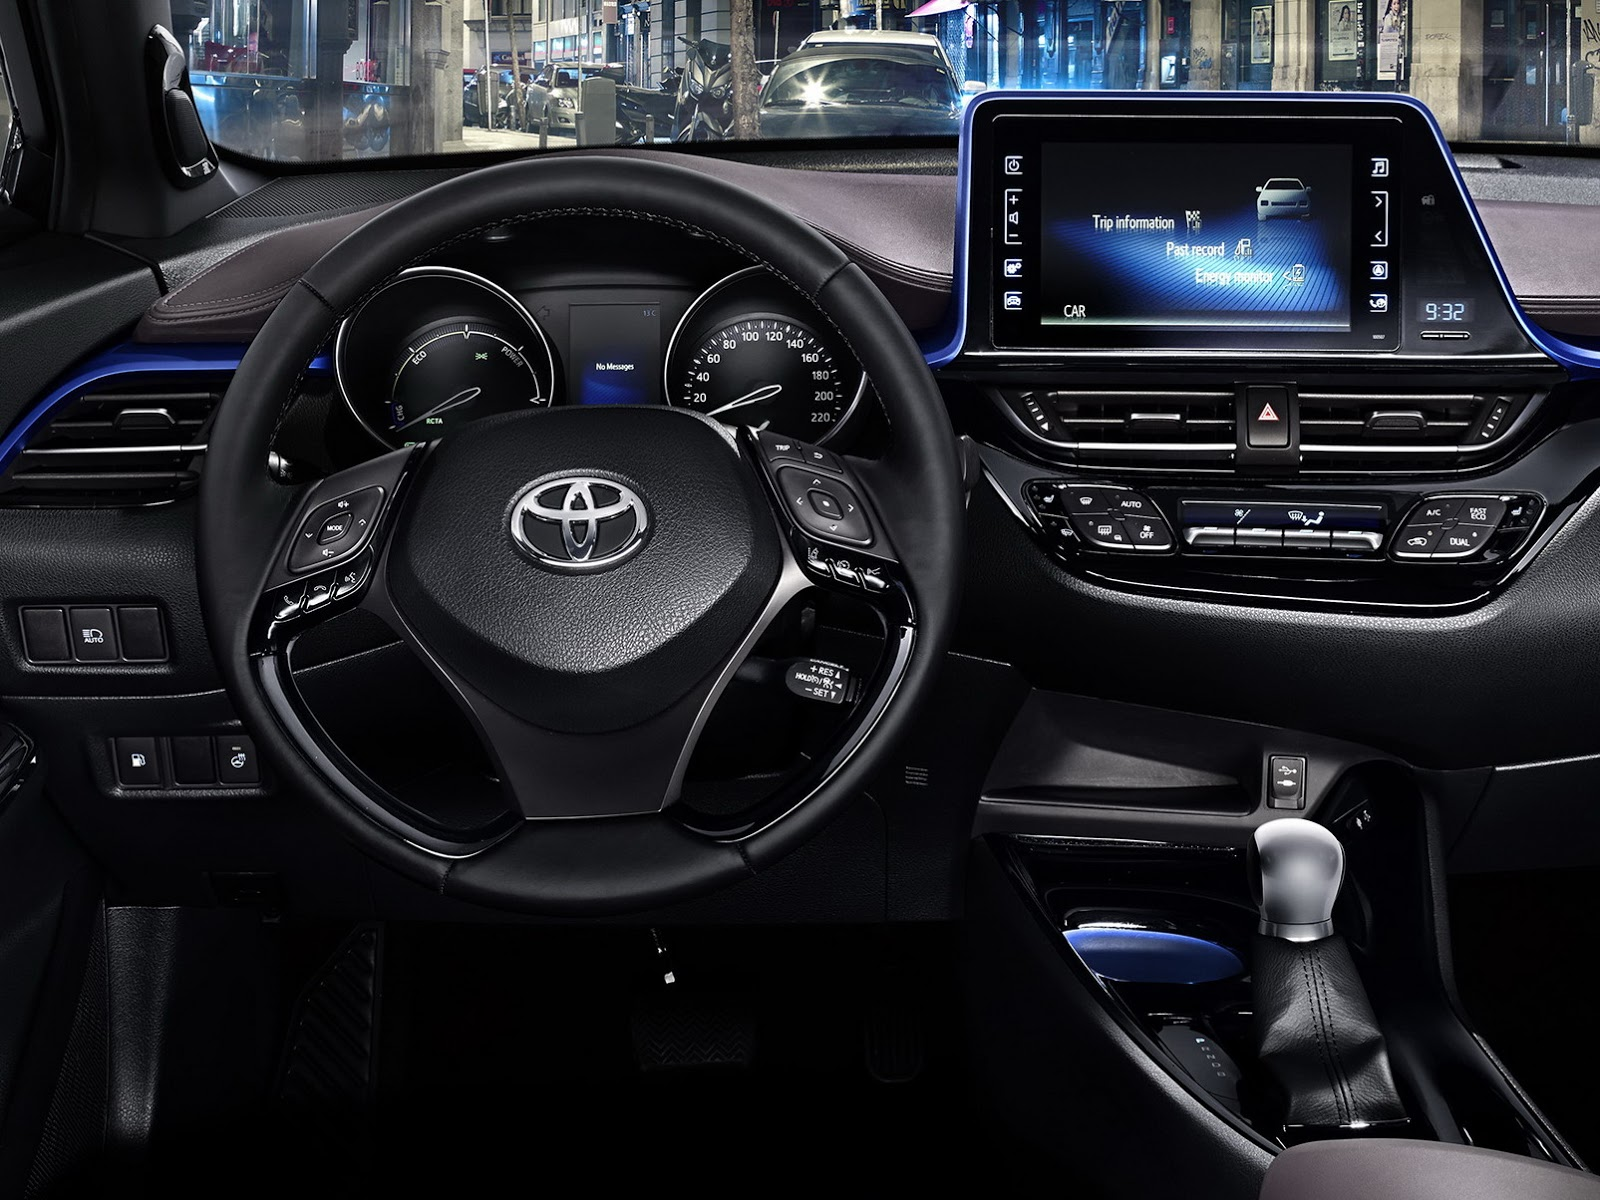 Interni Toyota C-HR 2017 - 7/23